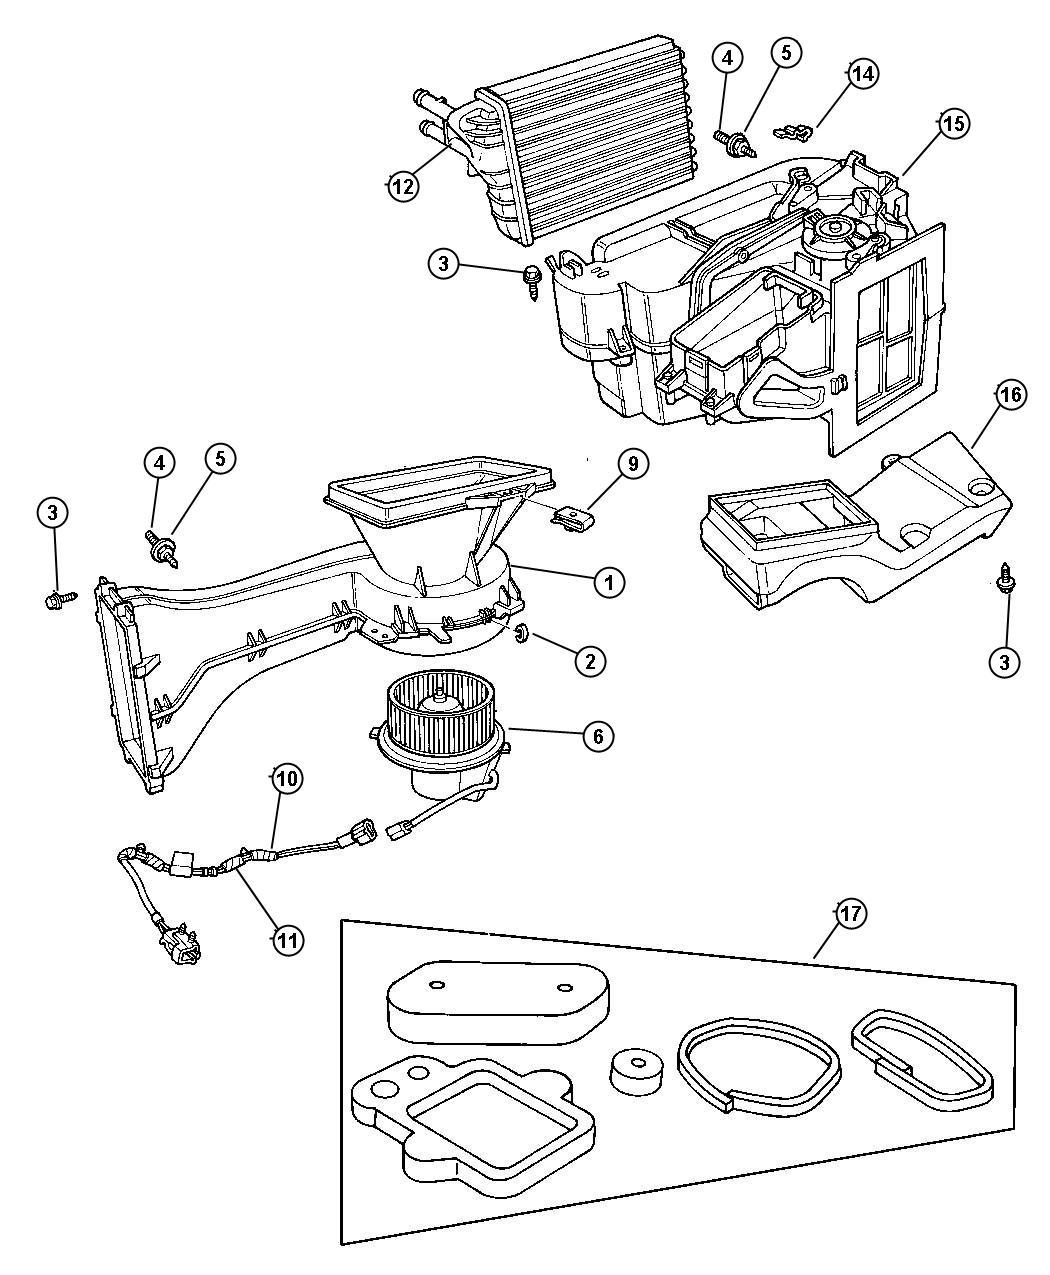 1997 Dodge Neon Motor package. Heater blower. Air